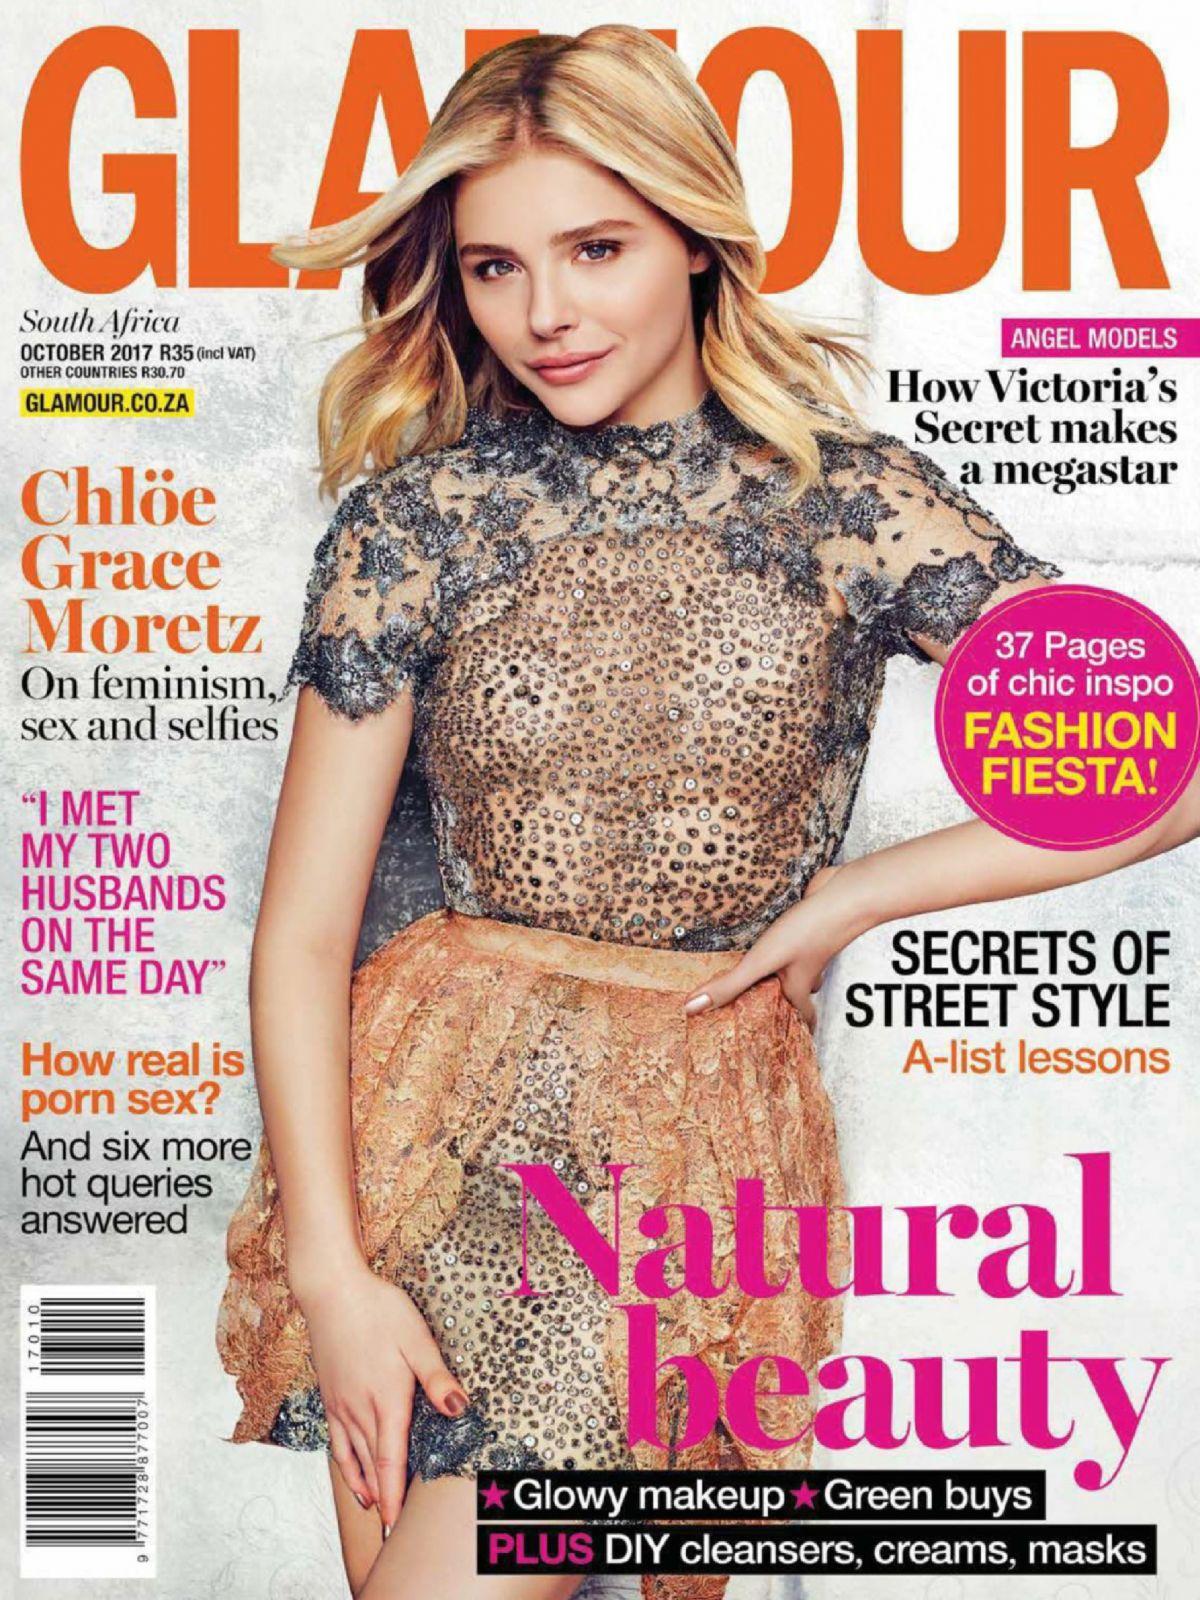 CHLOE MORETZ in Glamour Magazine, South Africa October 2017